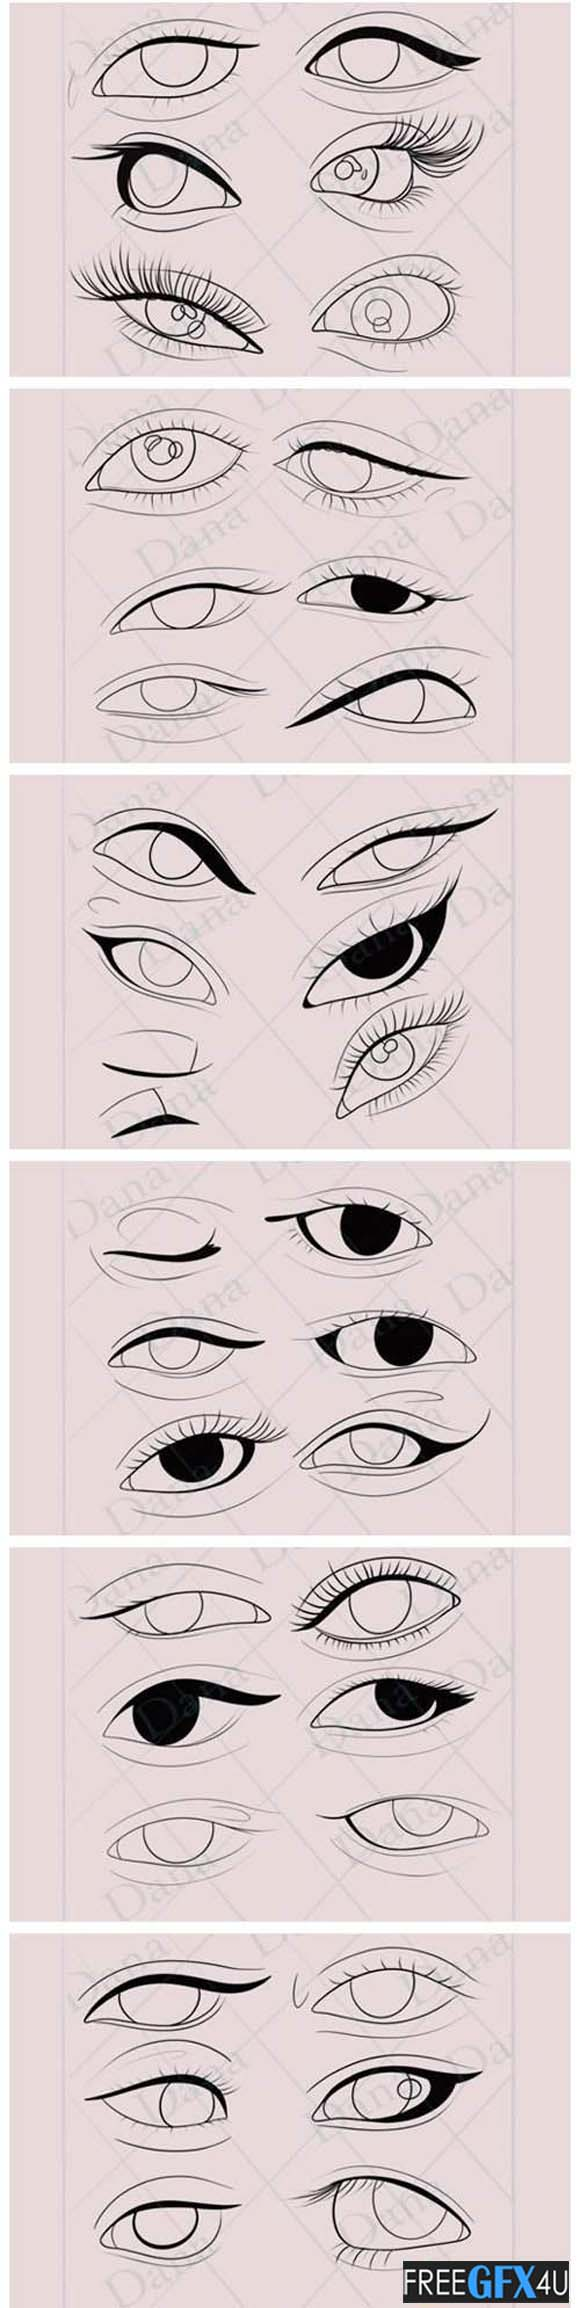 Procreate Eye Stamp Brushes Pack